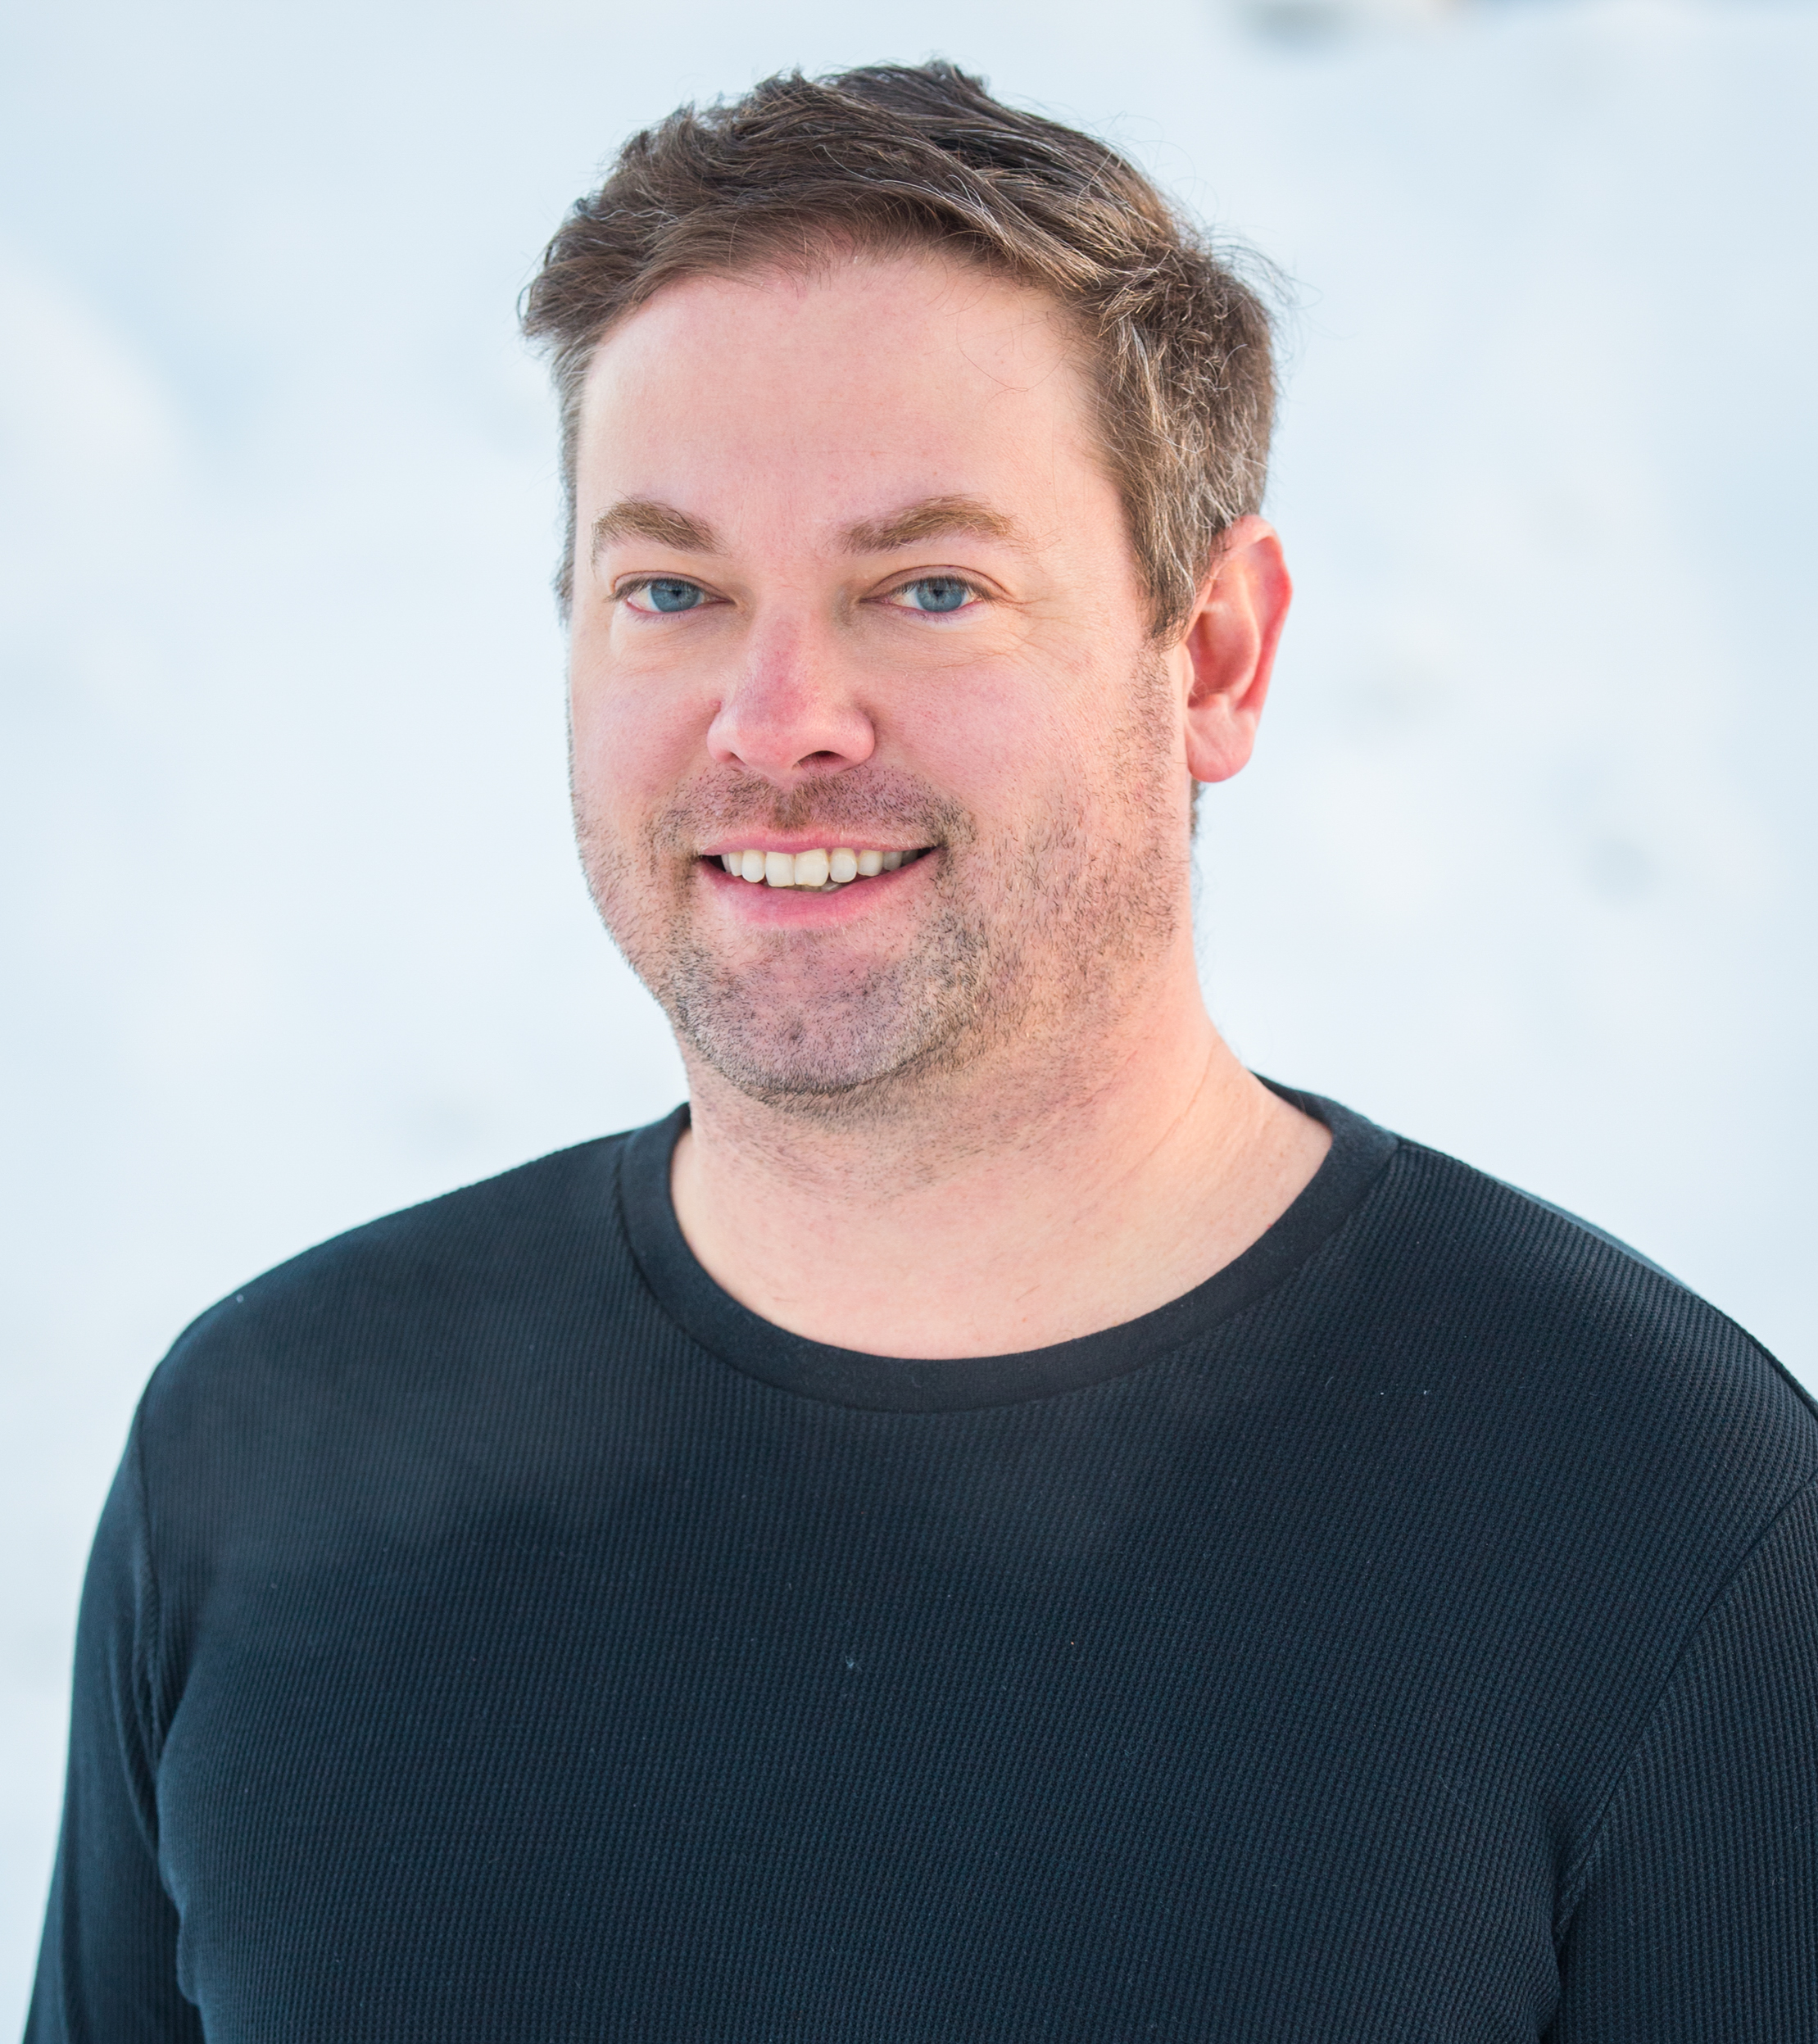 Stephen Karby - Producer